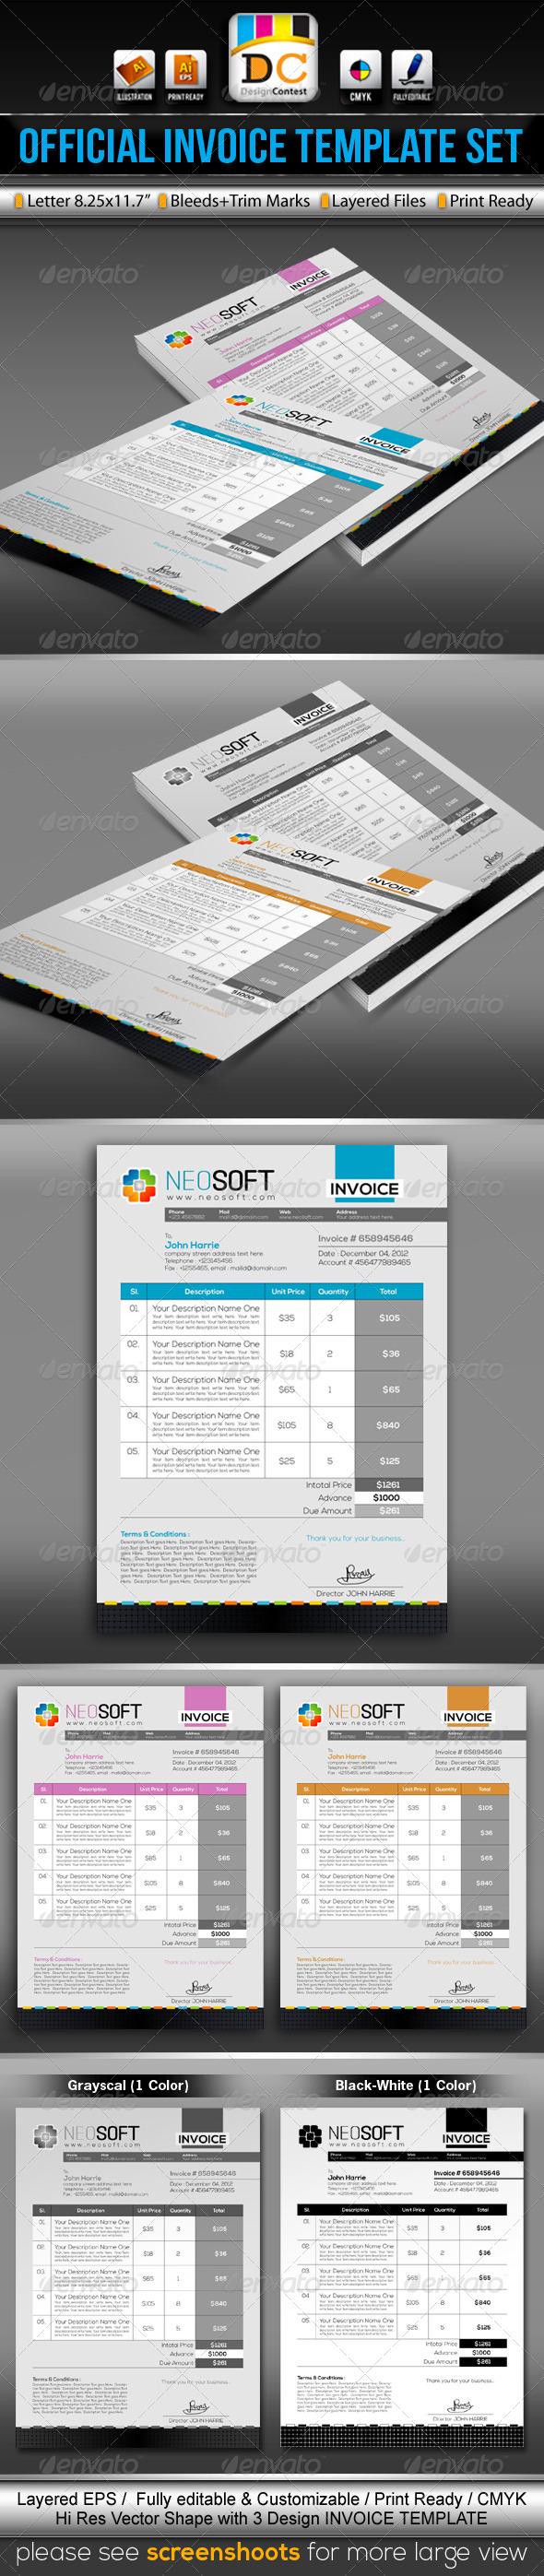 GraphicRiver NeoSoft Official Invoice Cash Memo Template Set 3557020